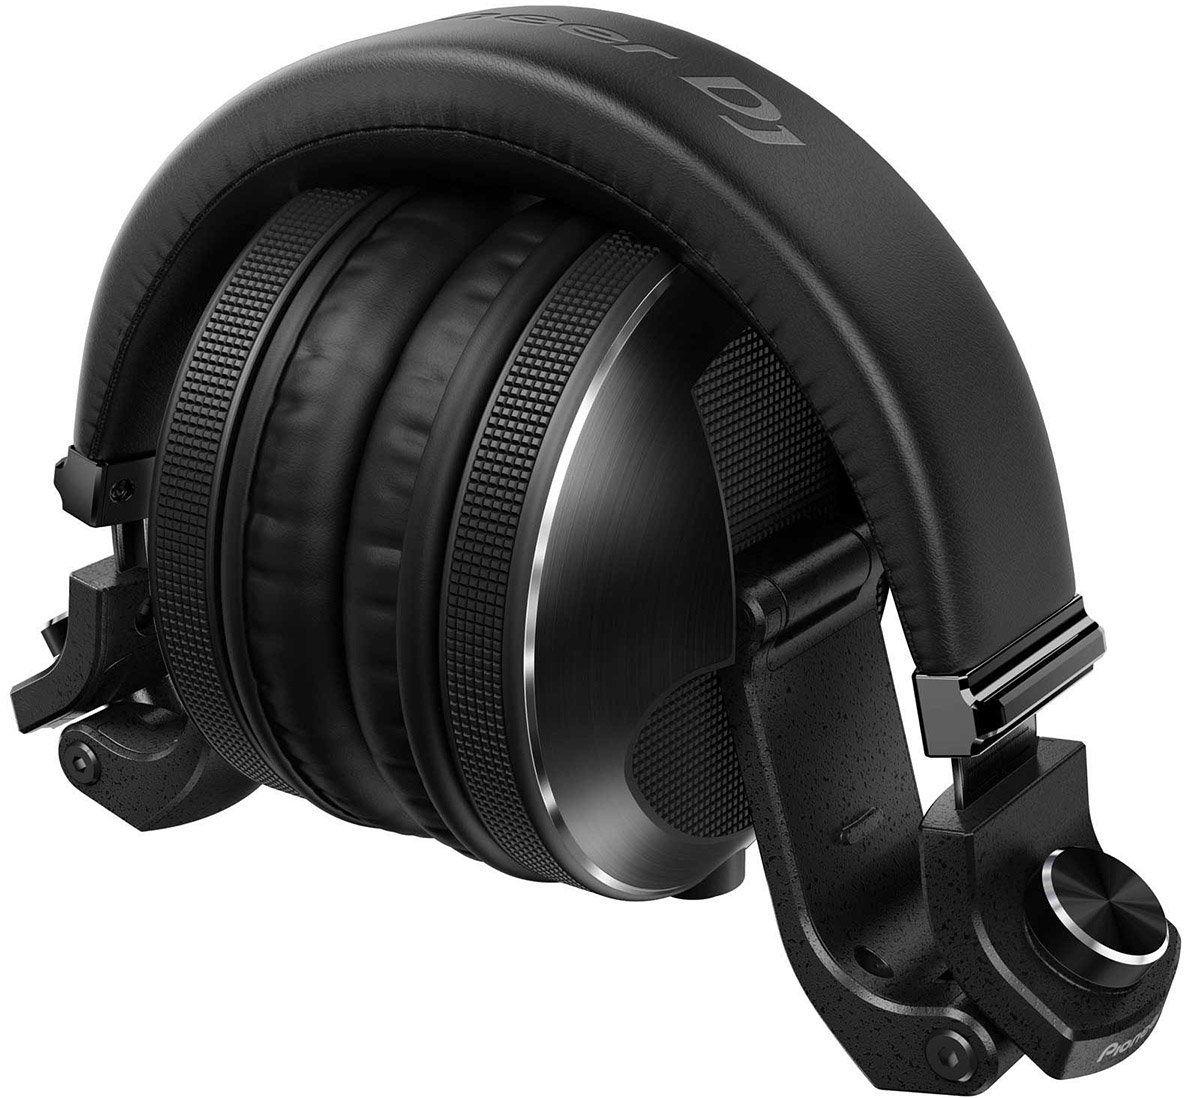 Pioneer HDJ X10 Fone de ouvido Pioneer HDJ-X10 para DJs Profissionais